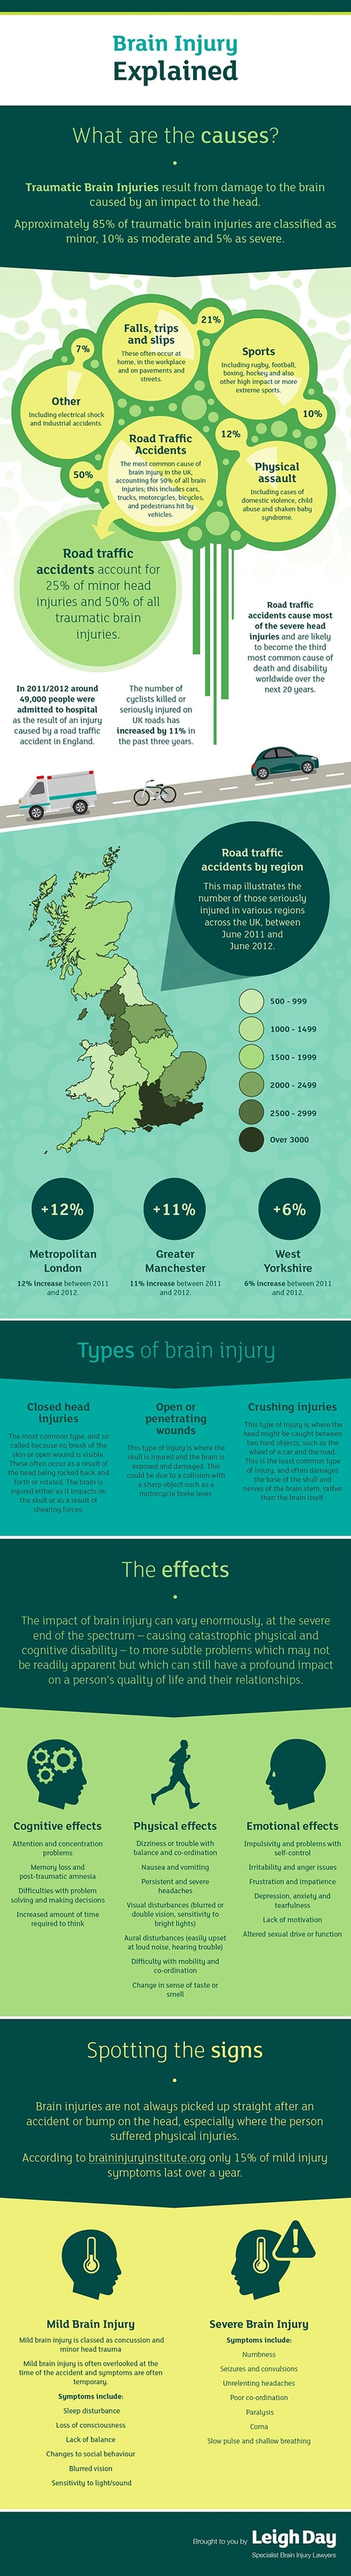 Brain Injury Explained (infographic)